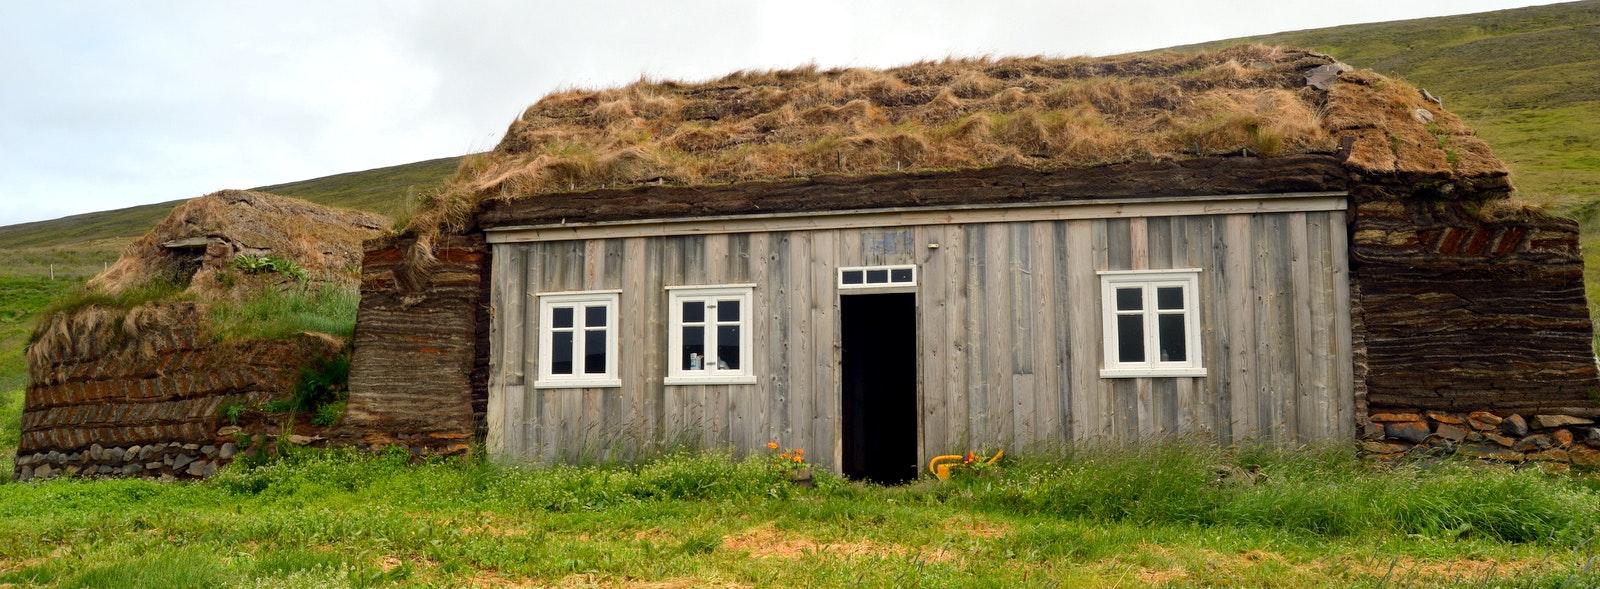 Tyrfingsstaðir Turf House in North-Iceland